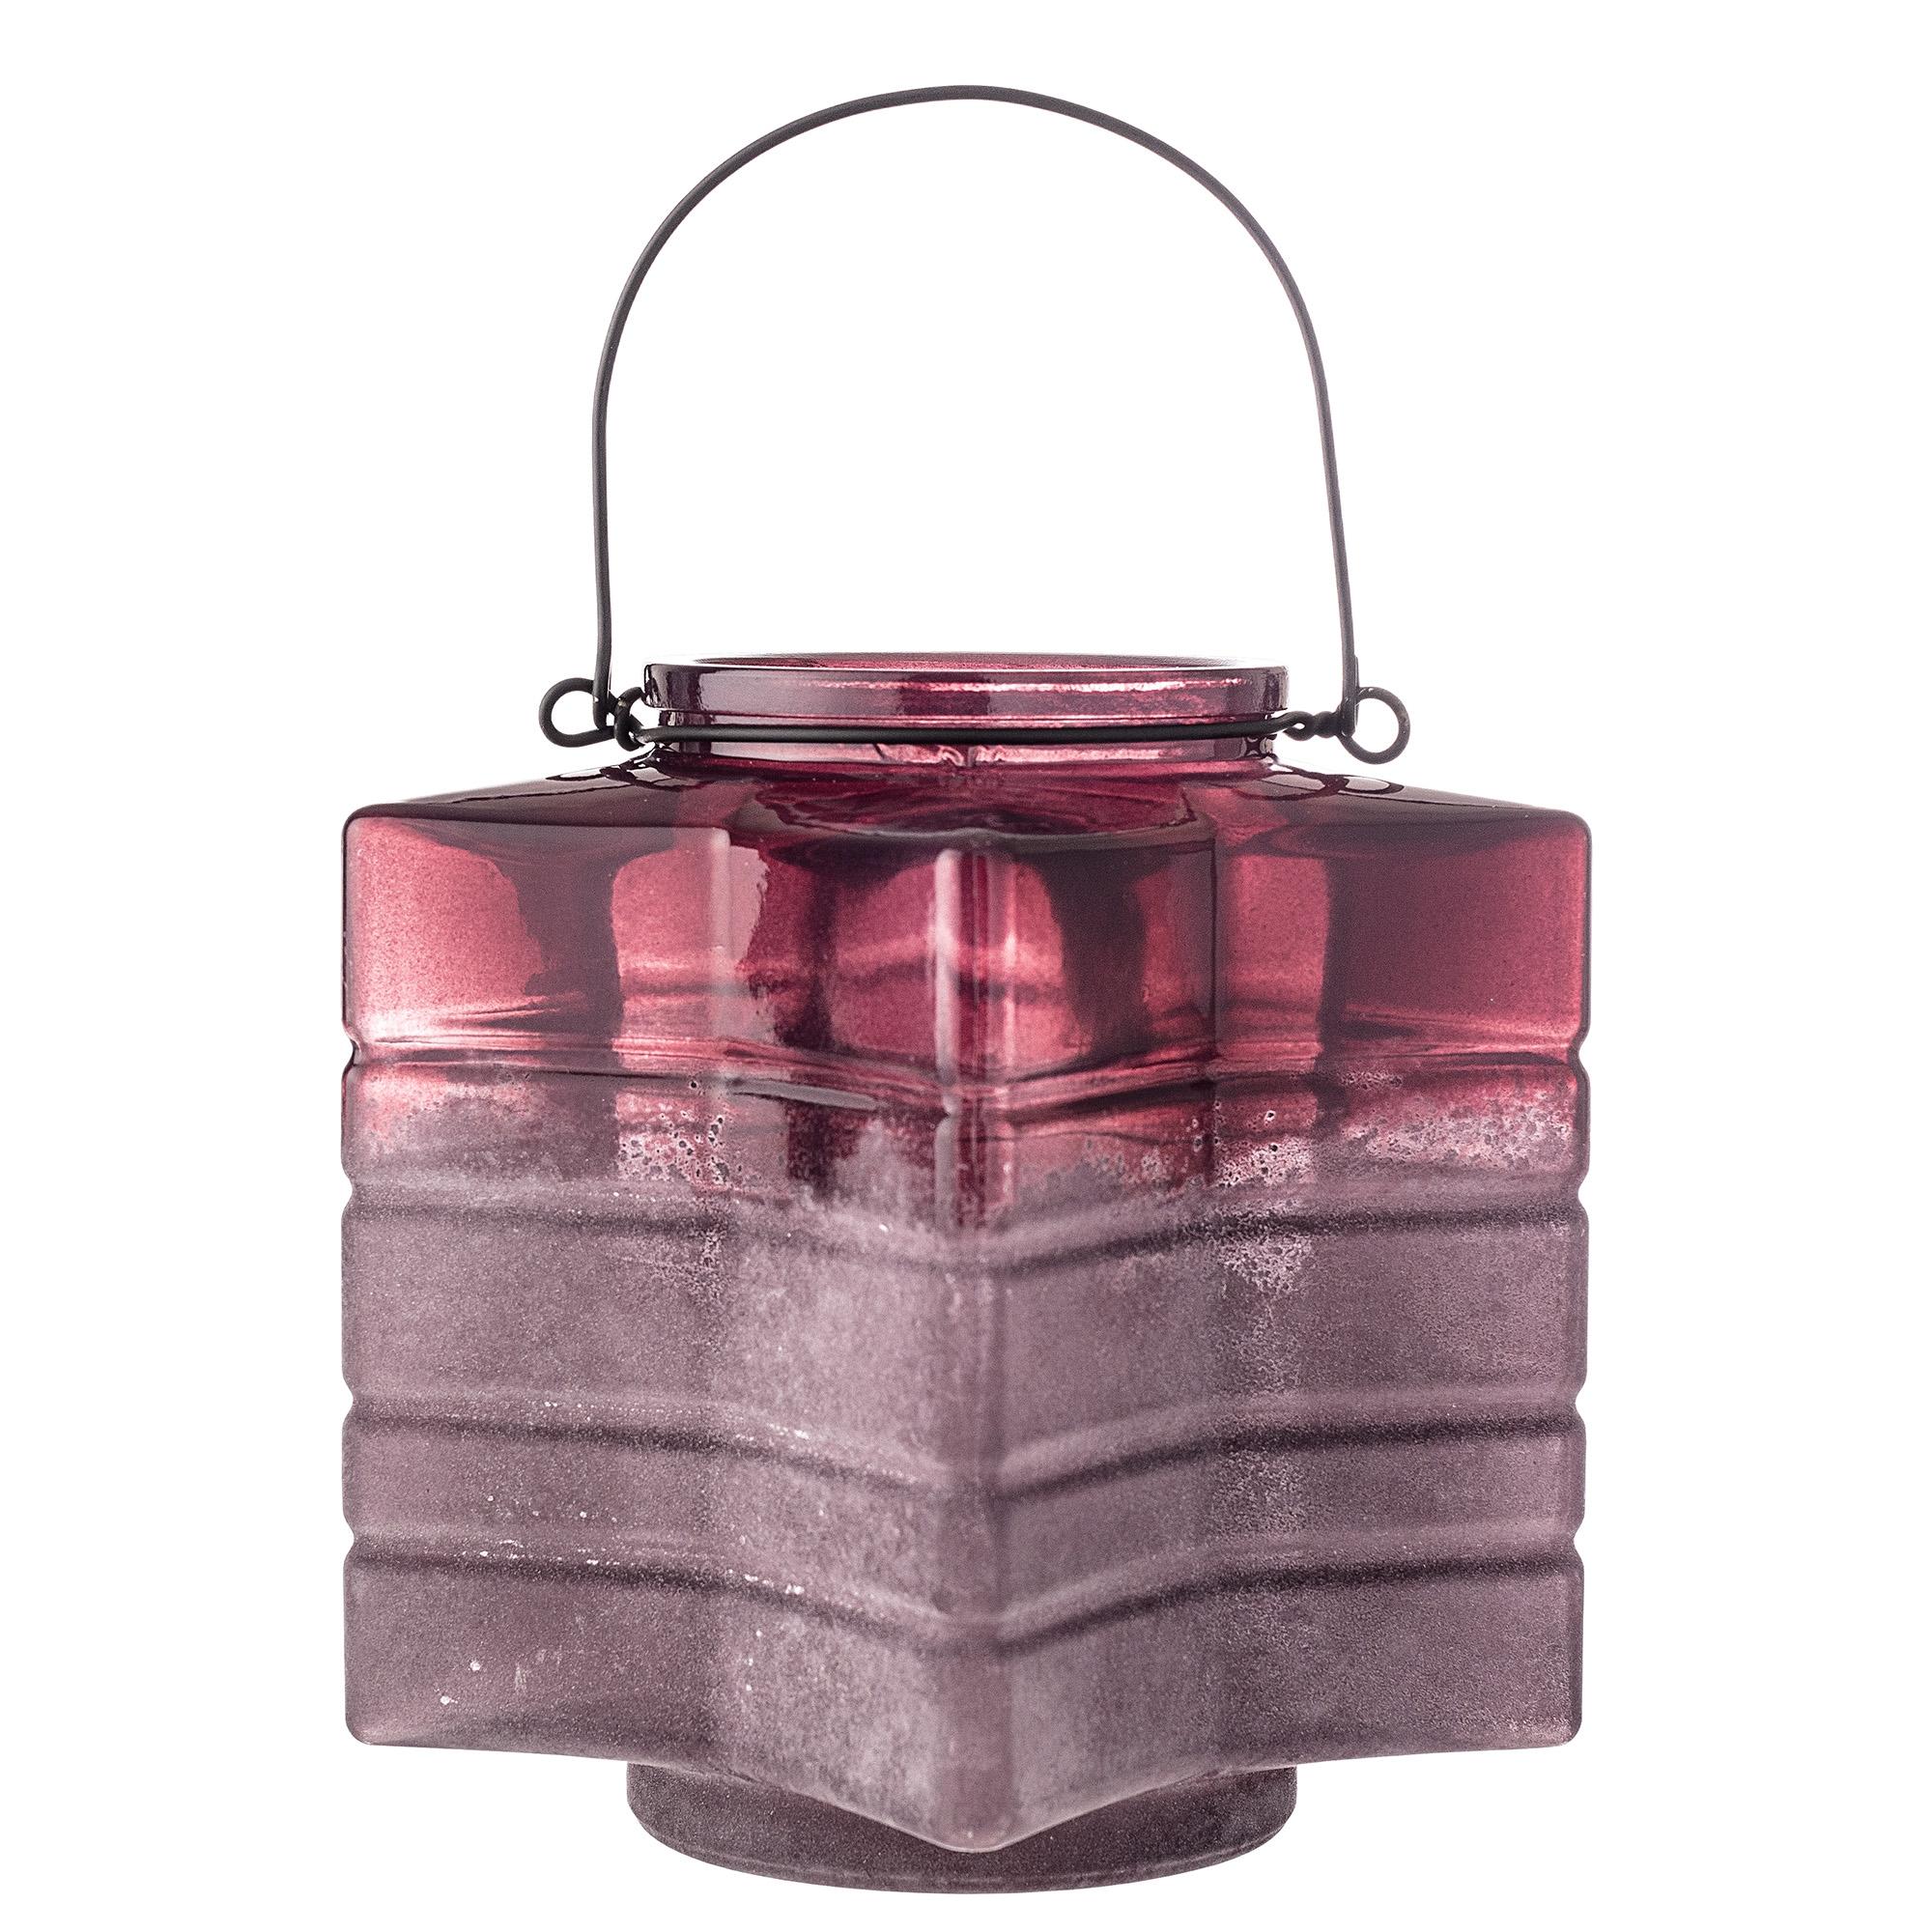 Suport lumanare din sticla Red, Ø18xH18 cm imagine